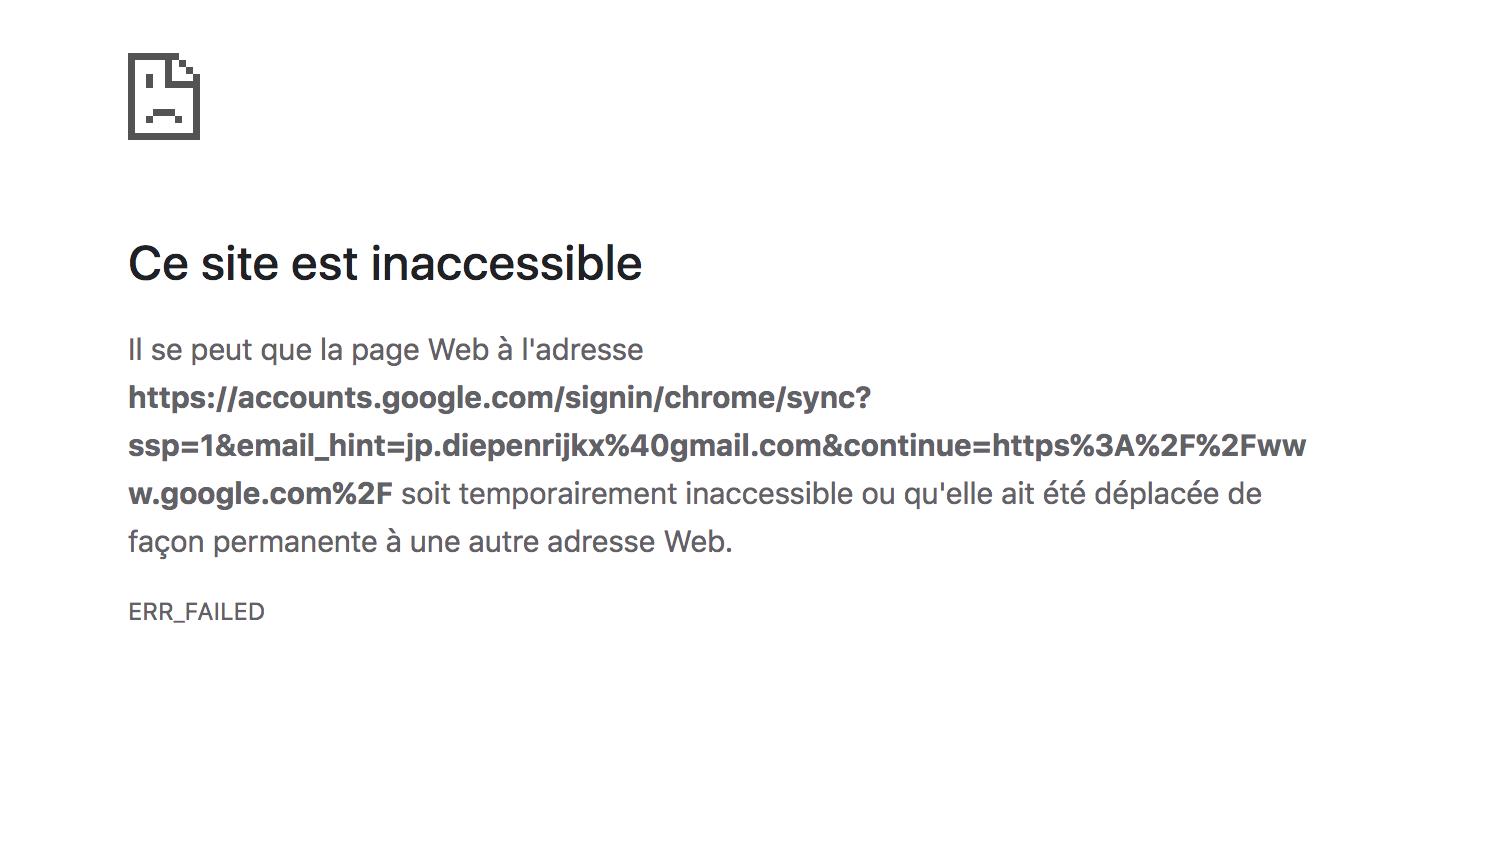 Ce Site Est Inaccessible